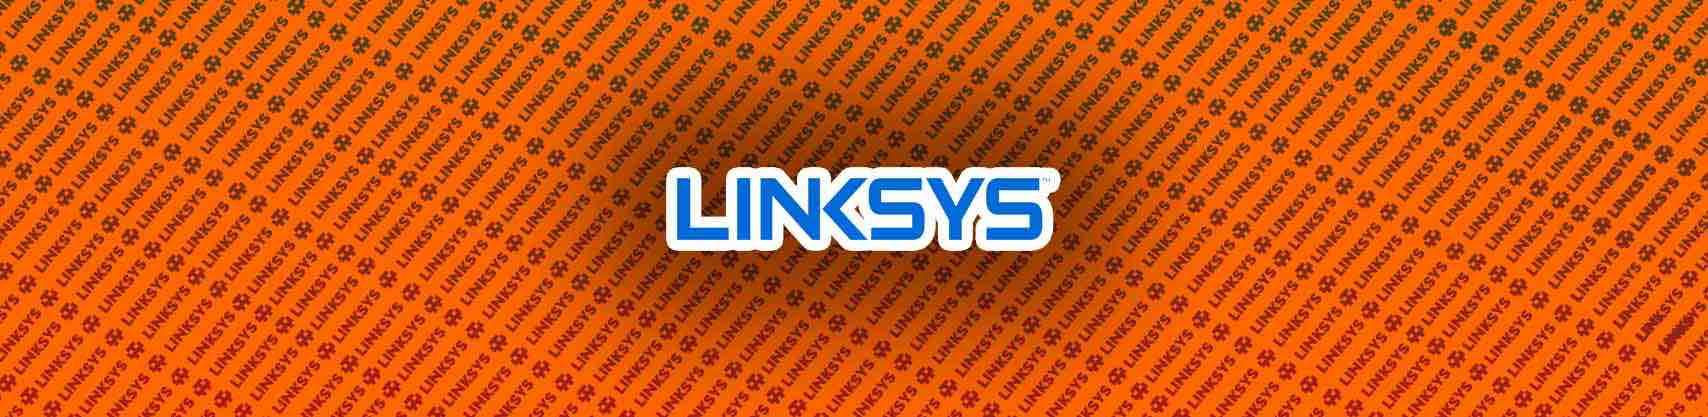 Linksys E1200 Manual